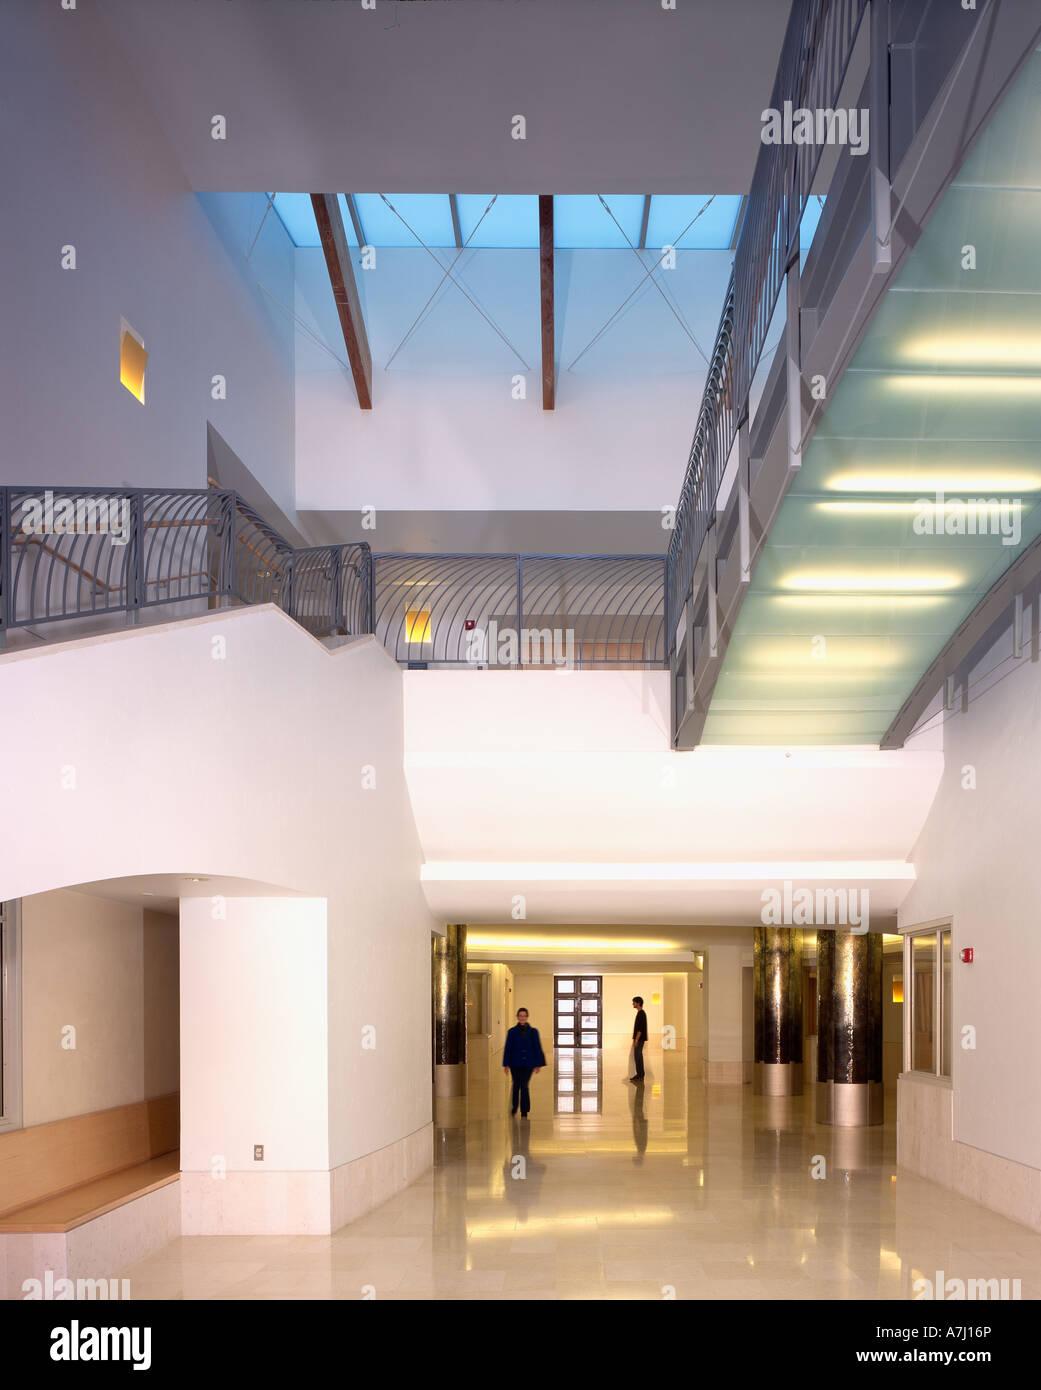 Gloria Kaufman Hall University Of California Los Angeles Ucla Stock Photo Royalty Free Image